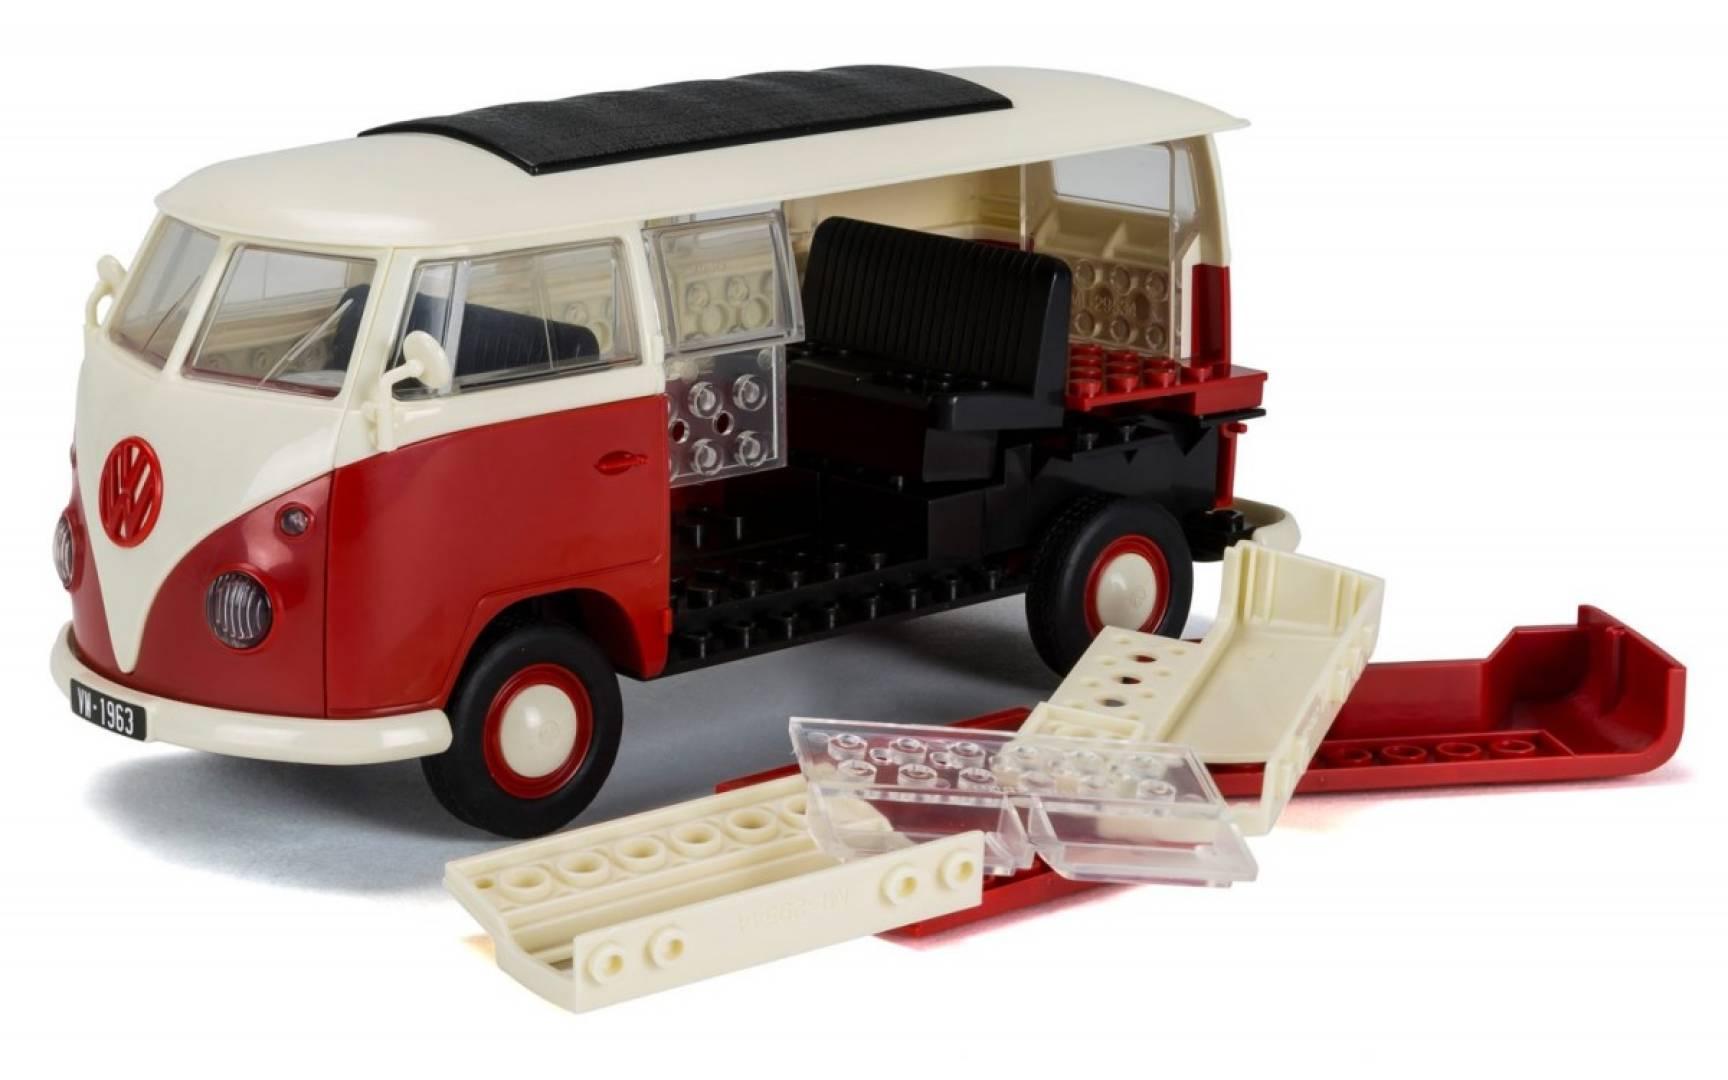 Model plastikowy QUICKBUILD VW Camper Van czerwony